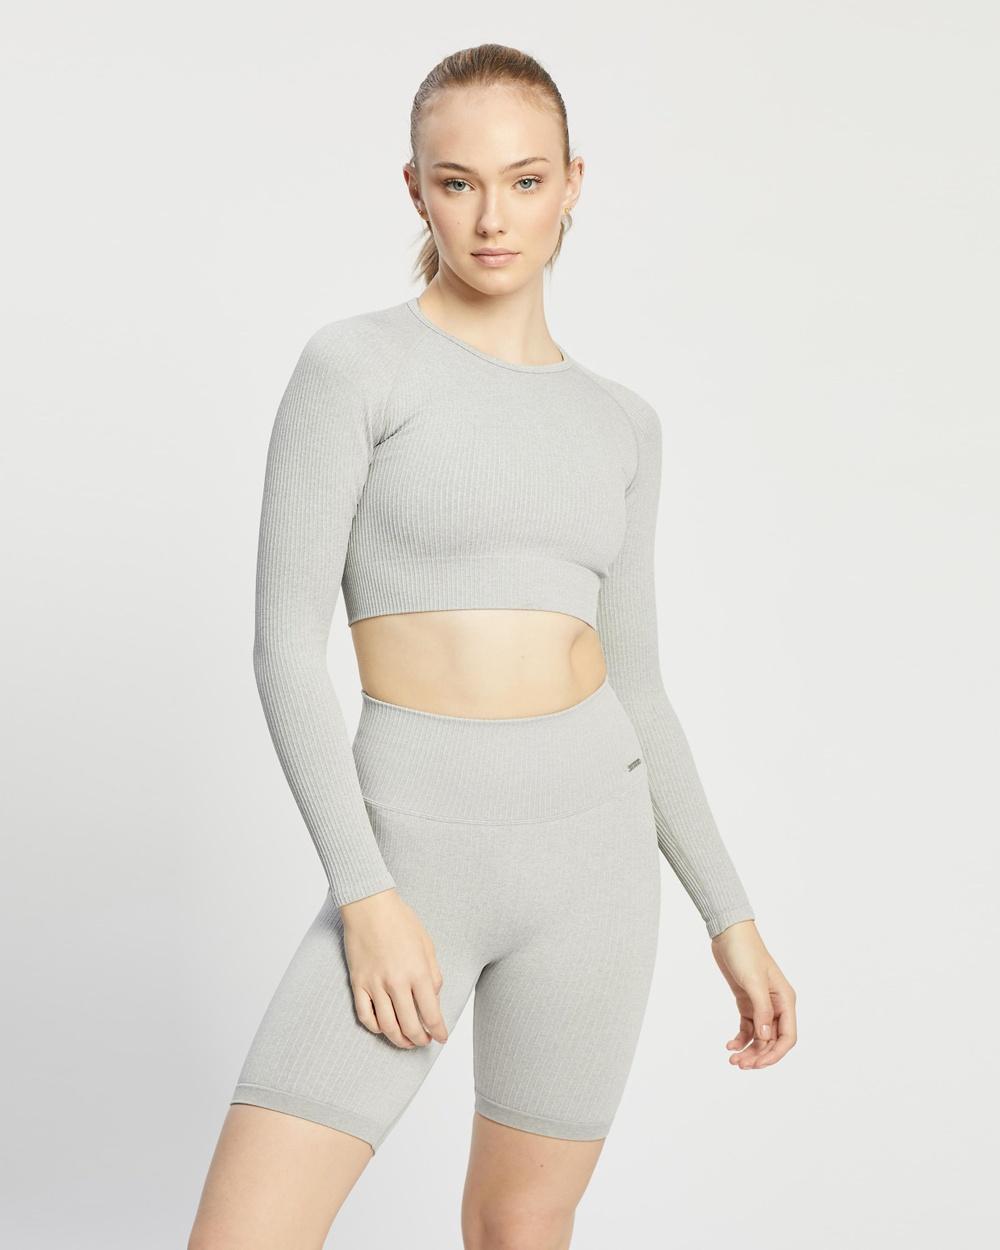 Aim'n Ribbed Seamless Crop Long Sleeve Top T-Shirts Light Grey Melange Australia